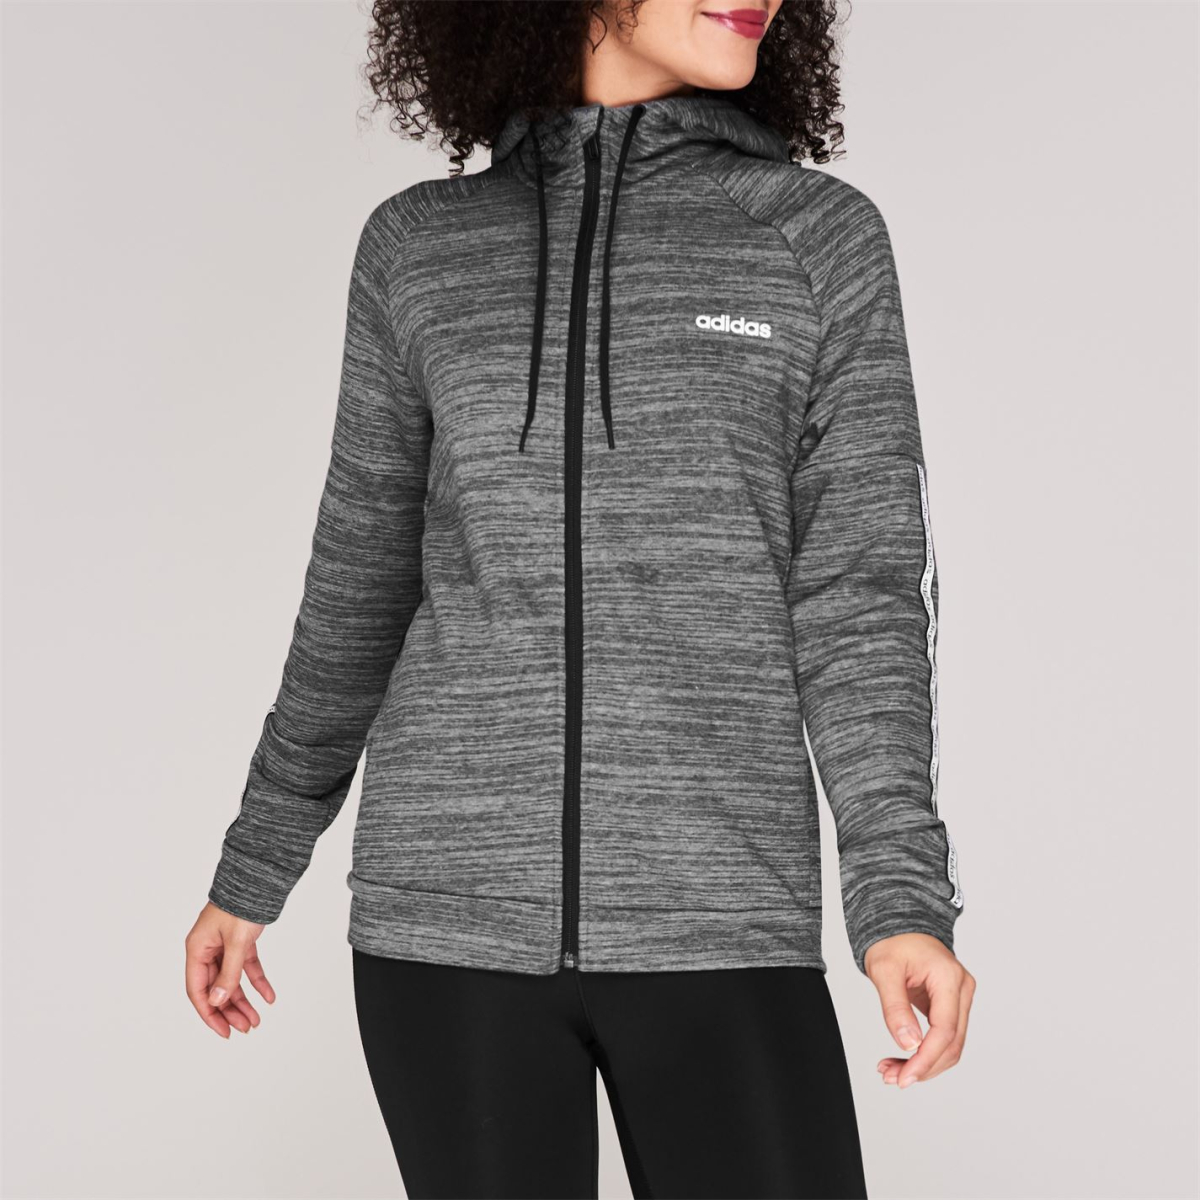 adidas Xpr Kapuzenjacke Jacke Damen Sweatshirt Kapuzenpullover Pullover 5390